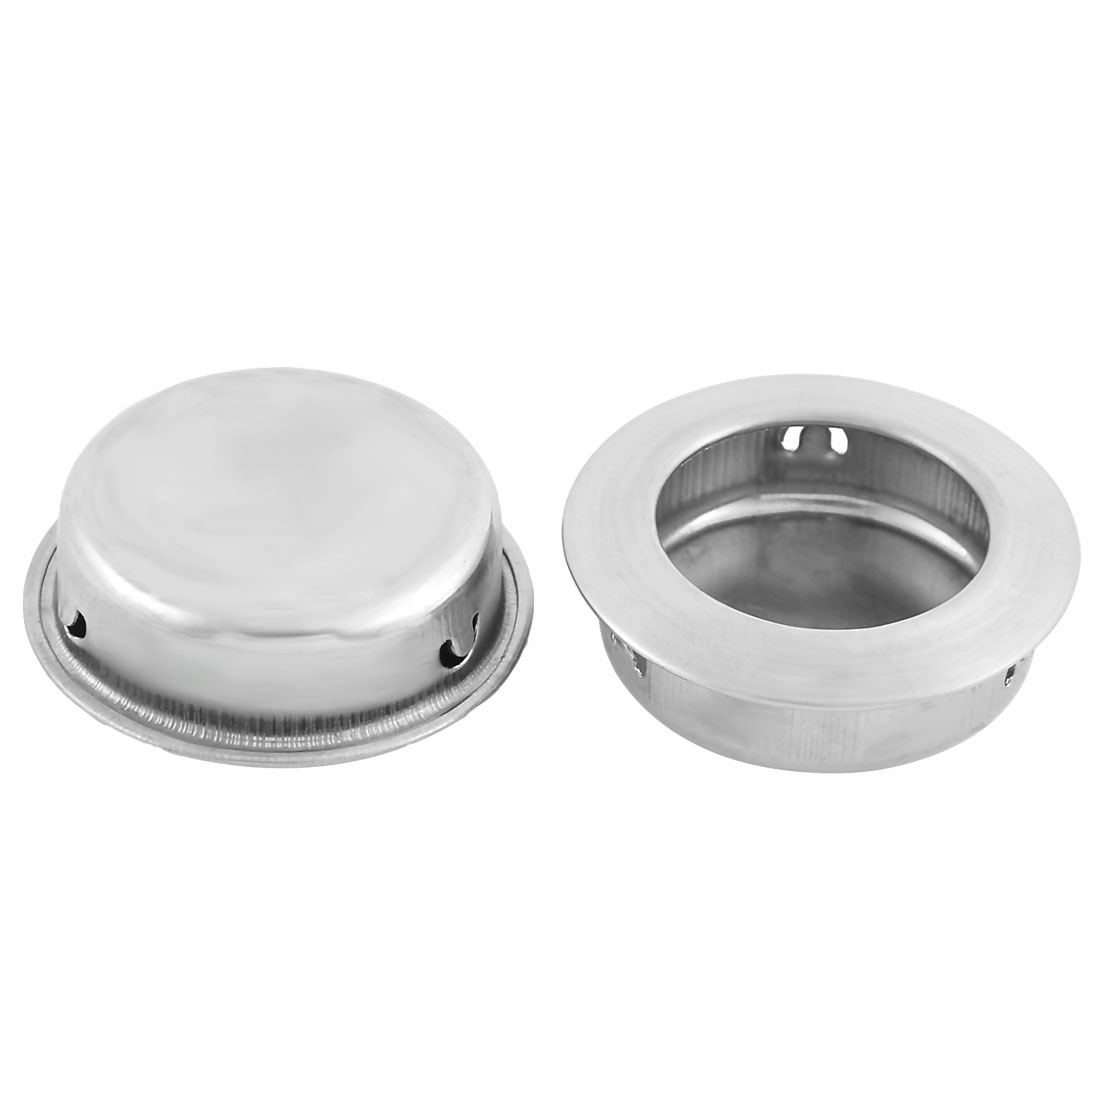 Cabinet Stainless Steel Circular Recessed Flush Door Handle Pull 40mm Dia 2 PCS